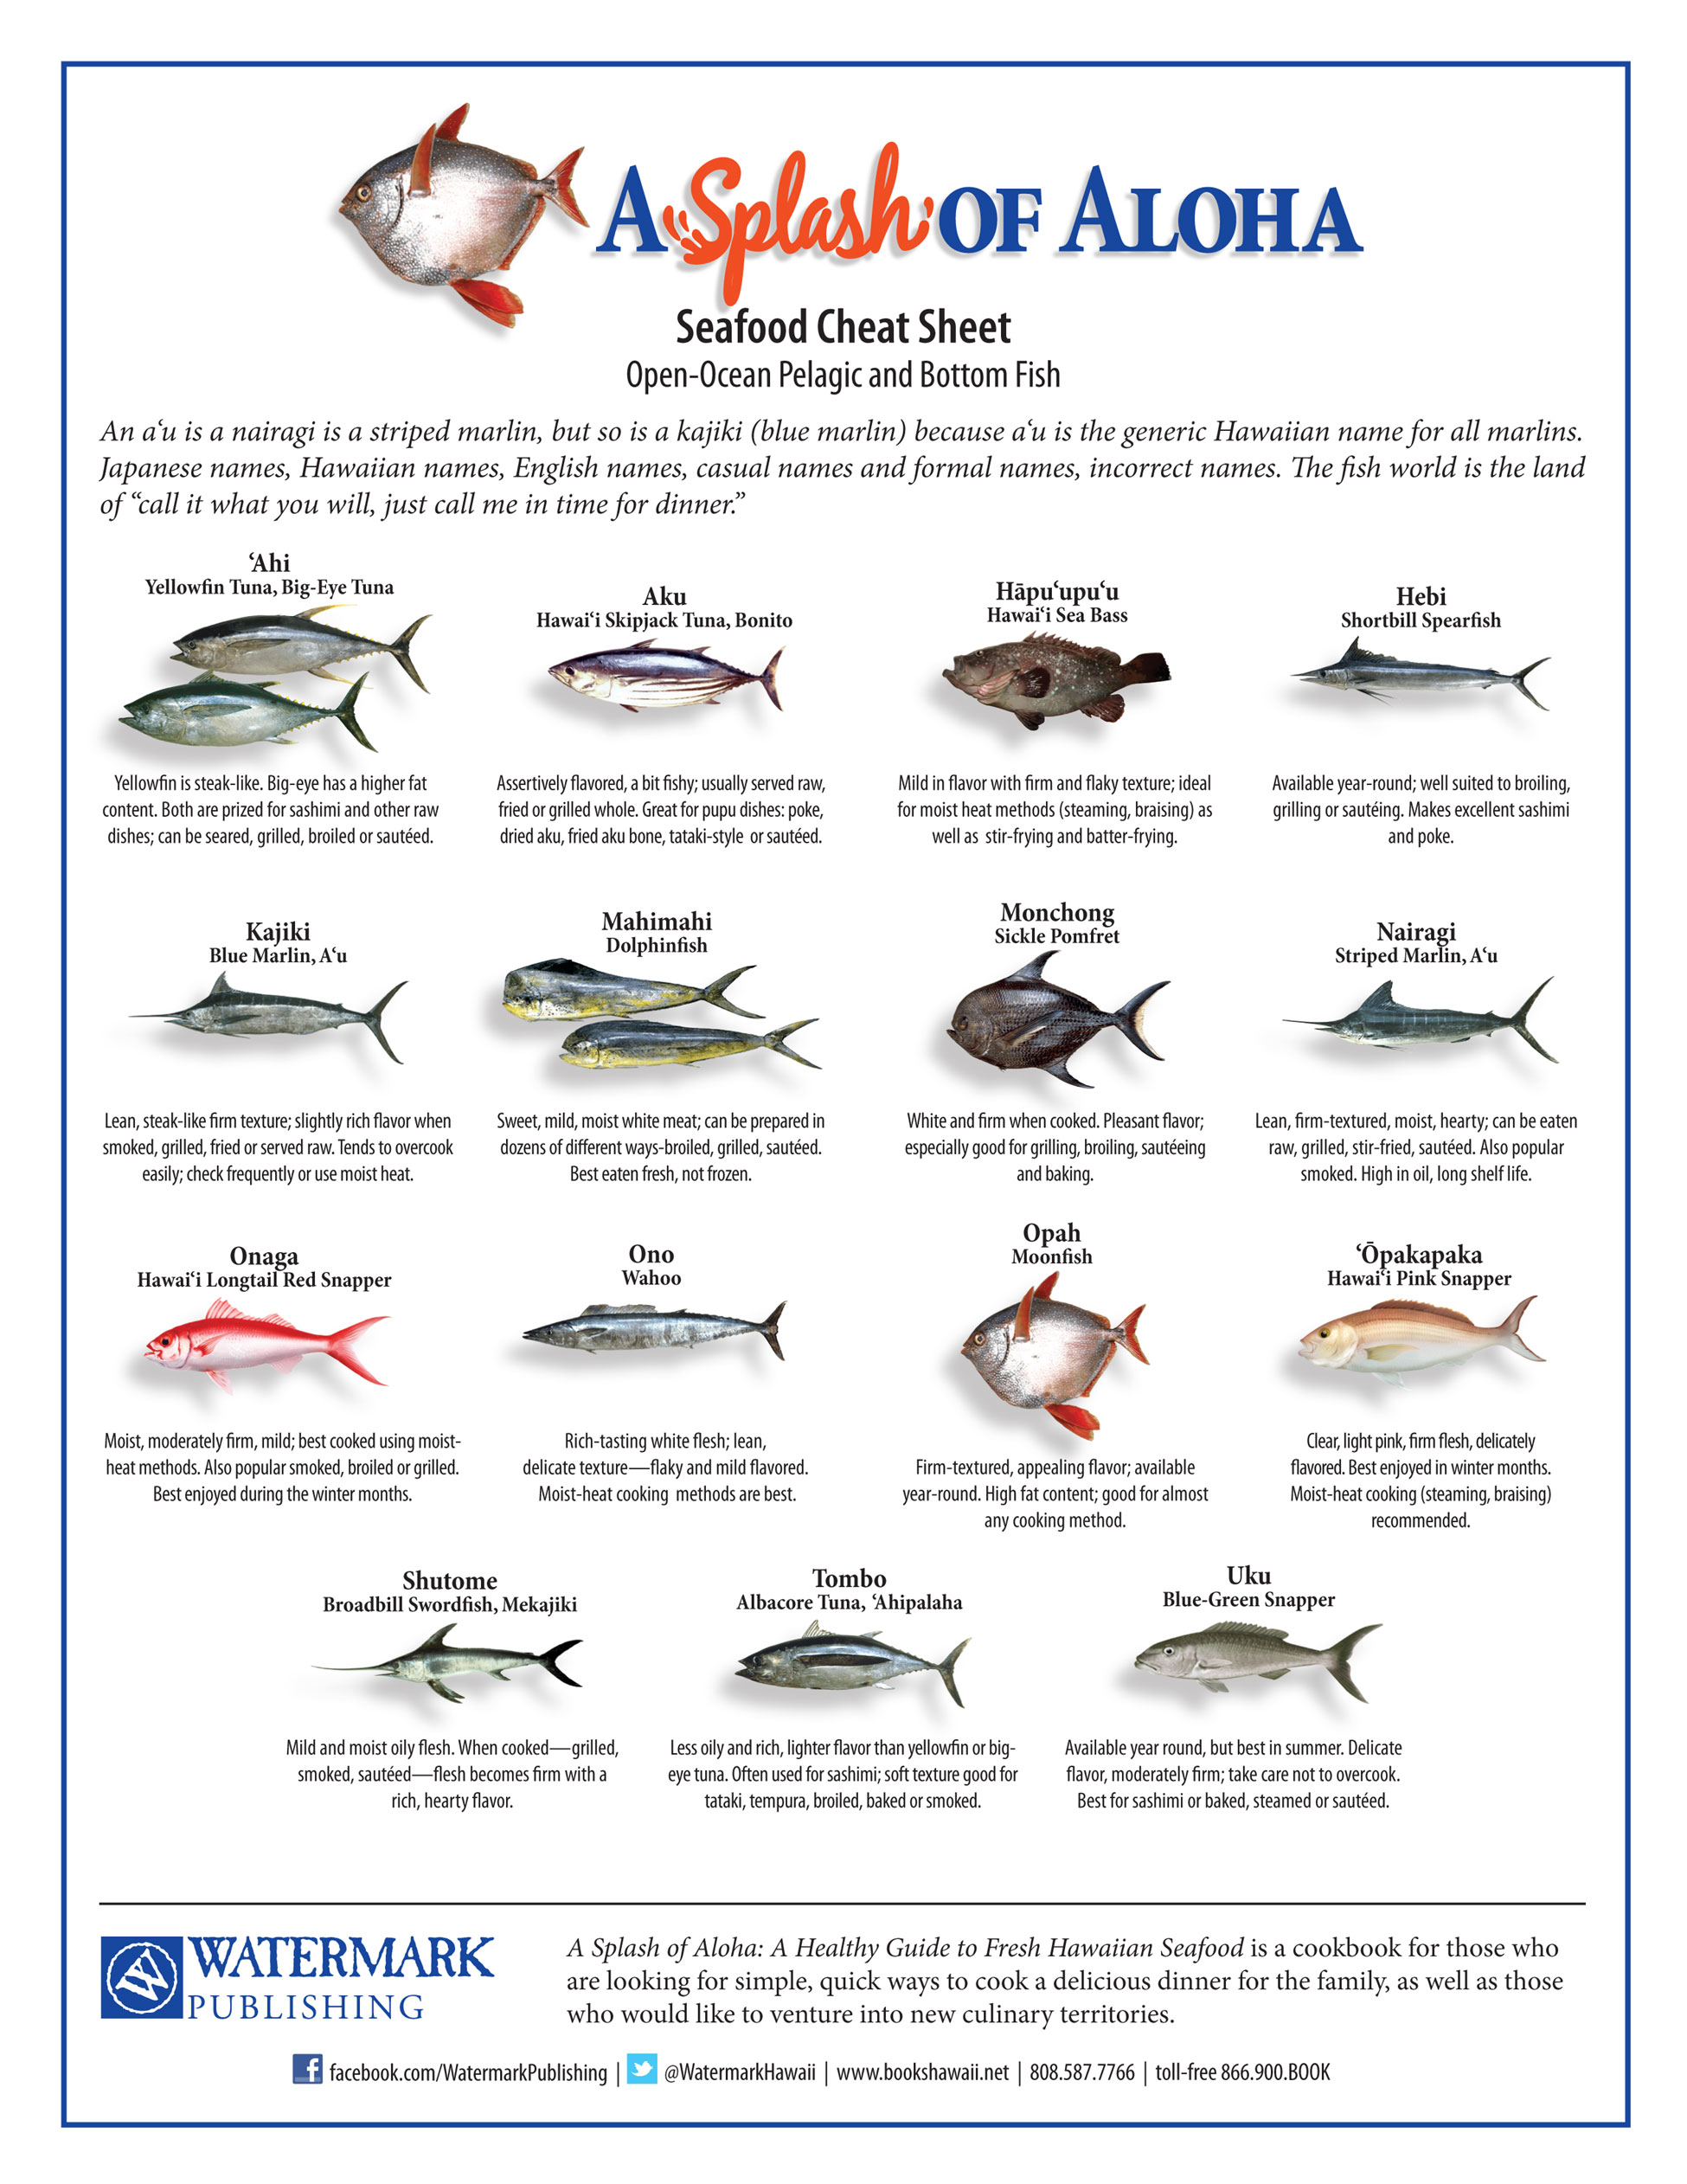 Press: Healthy Seafood, Served Up with a Splash of Aloha ...